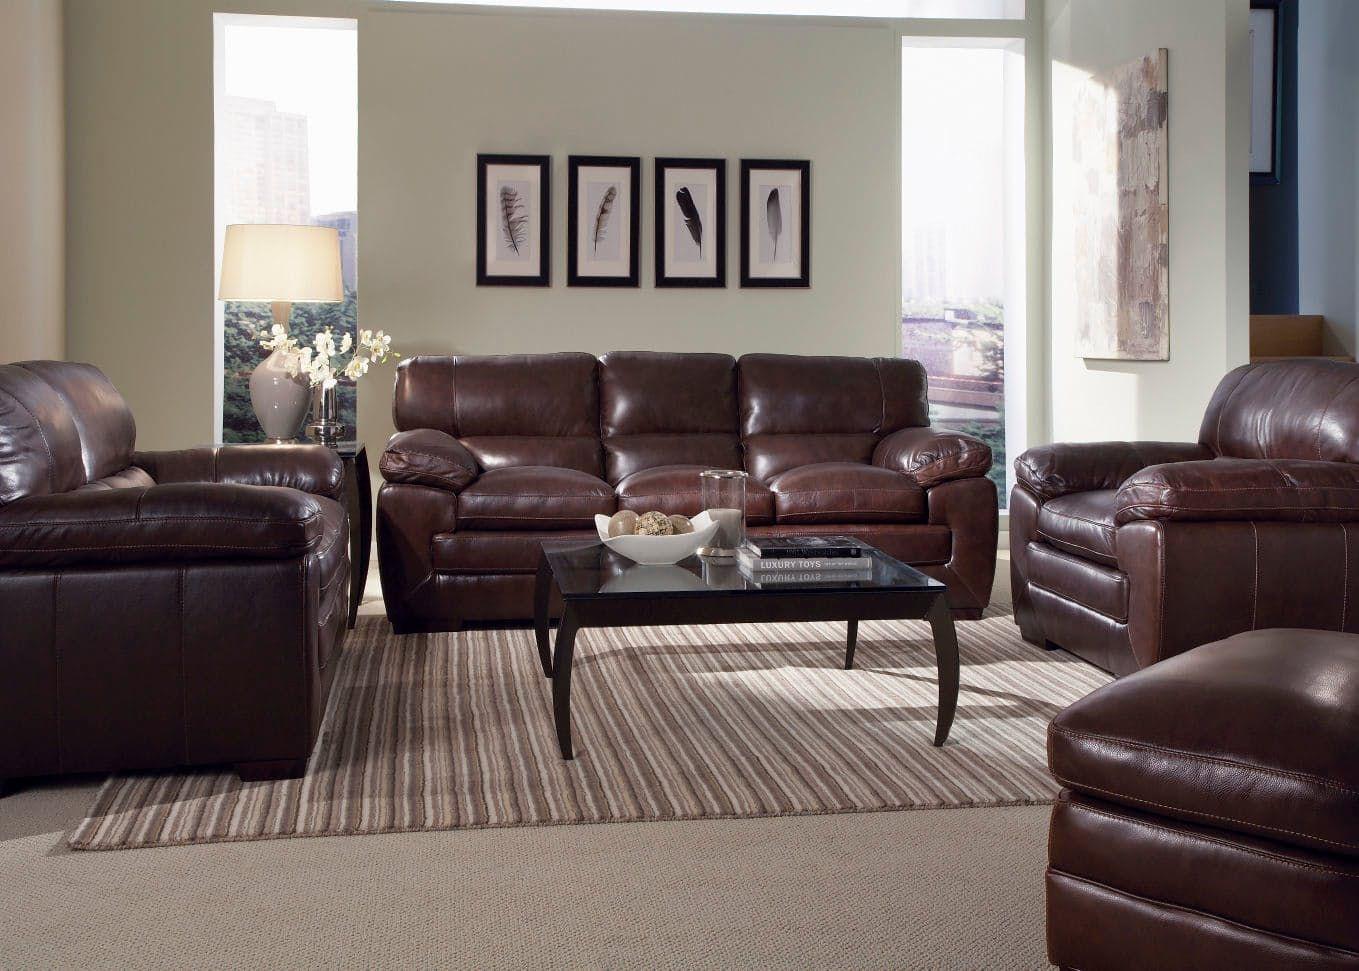 Amarillo Walnut Pub Back Sofa And Love Seat 100 Top Grain Leather Seating By Simon Li Set 2299 00 W91 D40 H37 W67 Oak J386